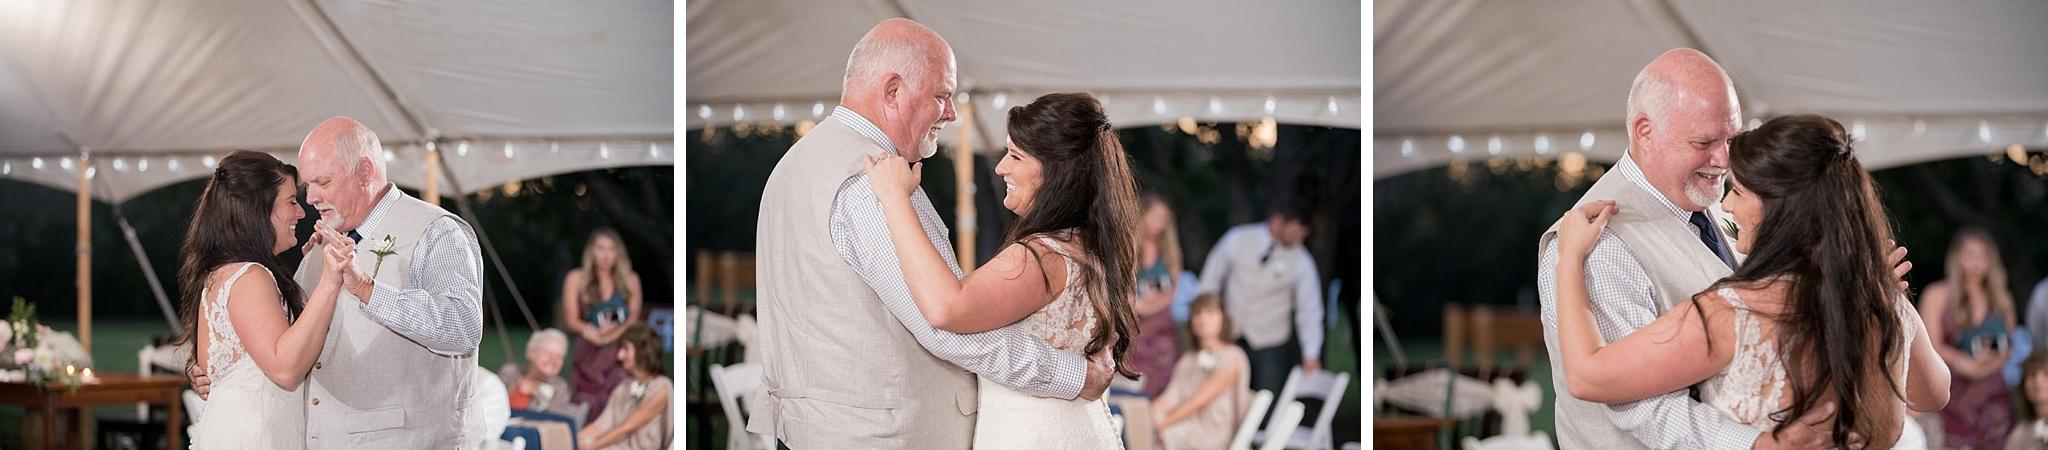 Tarboro-NC-Wedding-Photographer-071.jpg